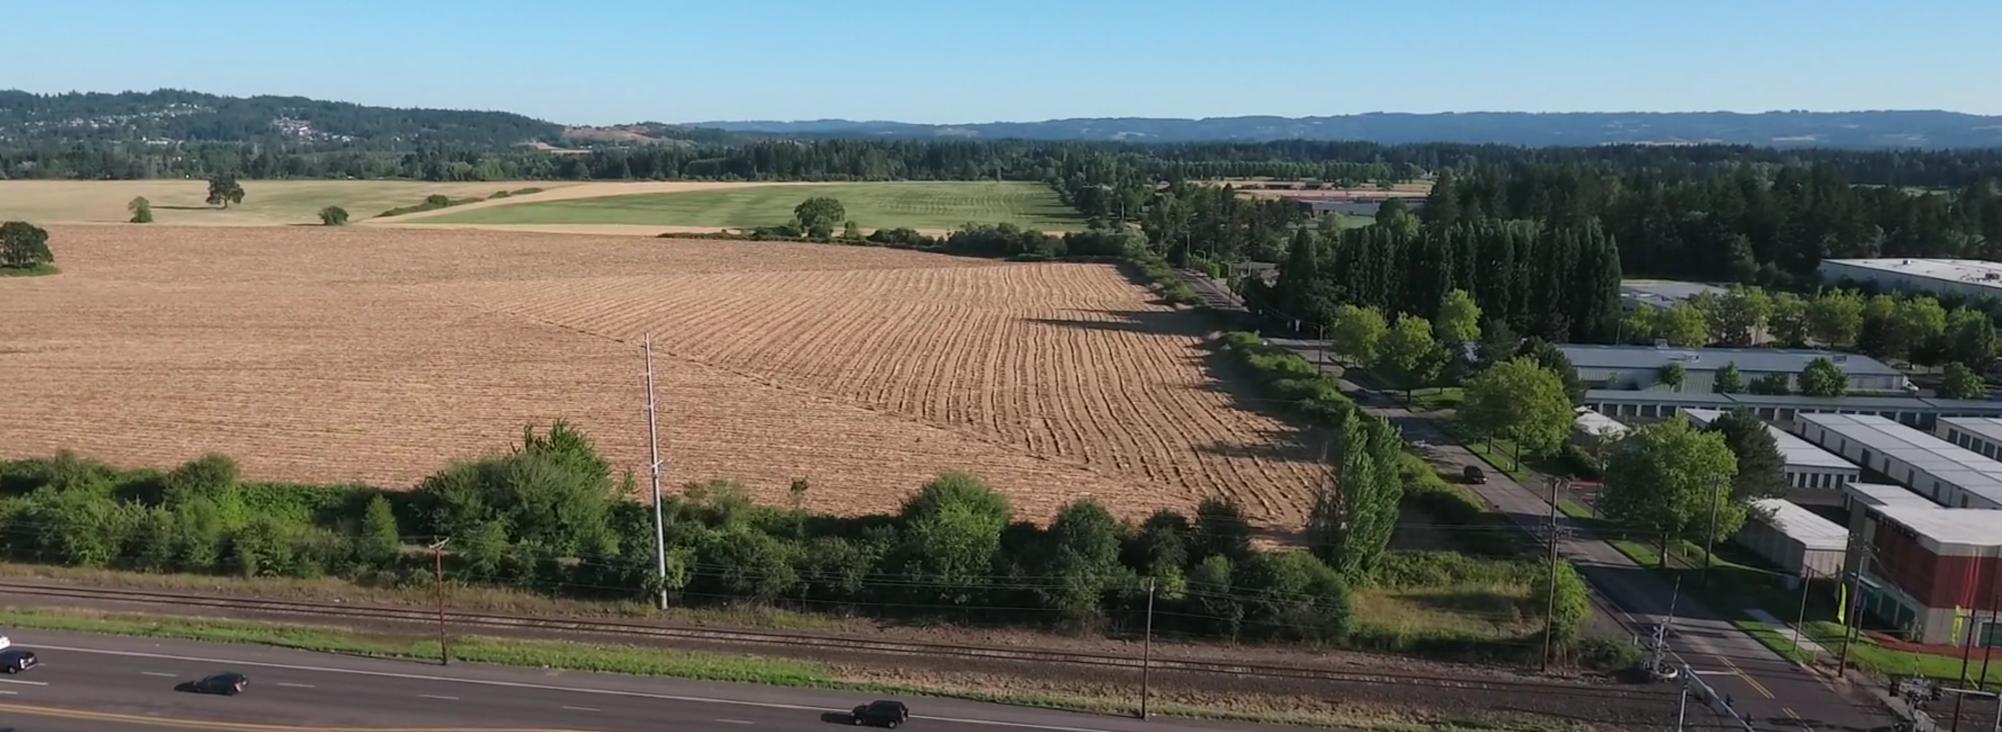 South Hillsboro aerial